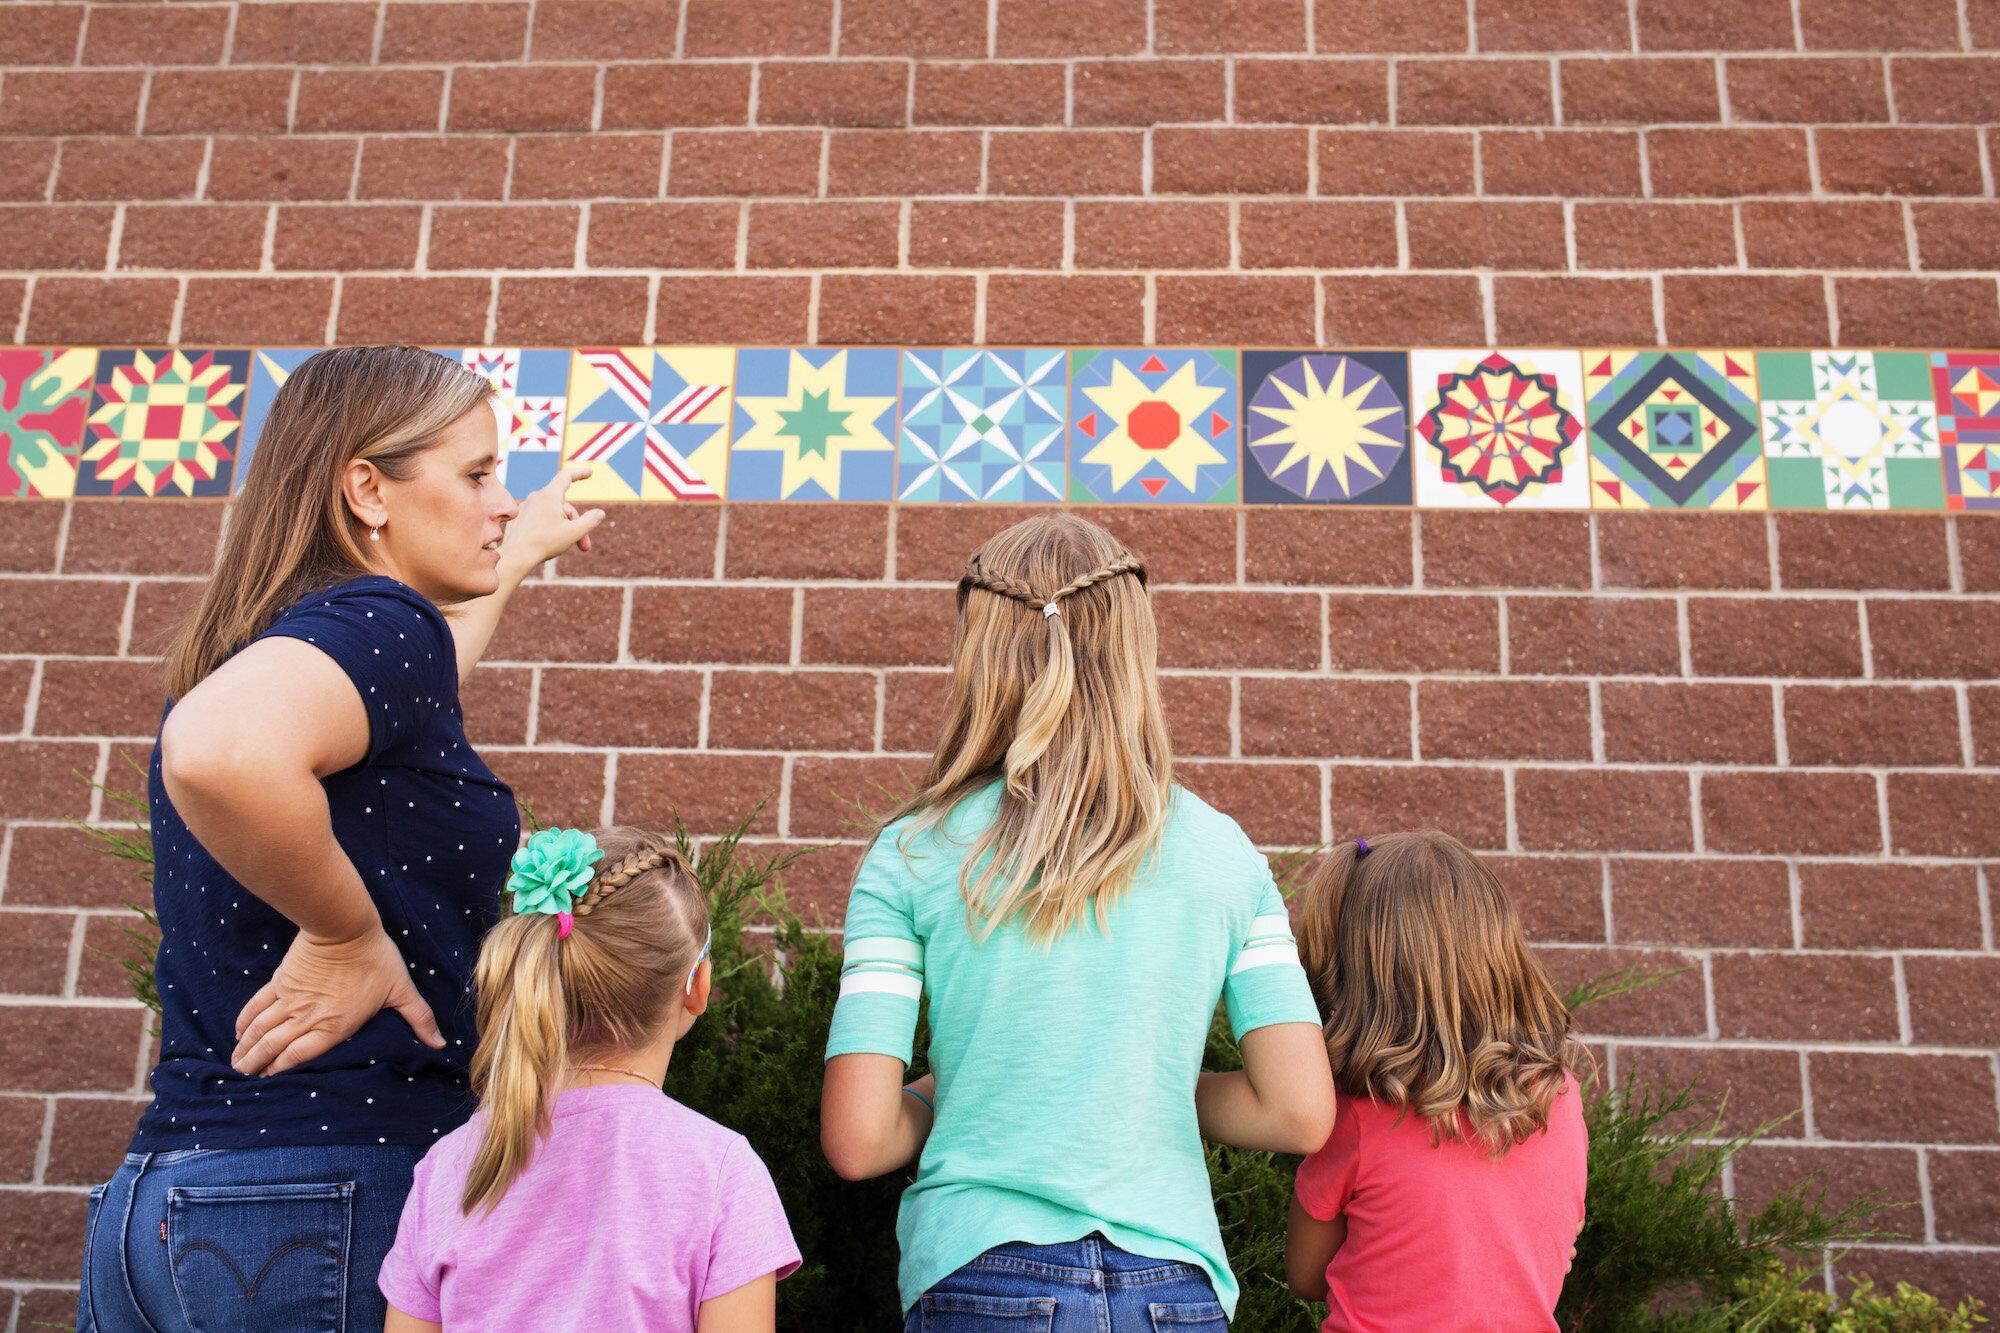 Leila Gardunia showing her children quilt block mosaics at Iowa State Fair copy.jpg